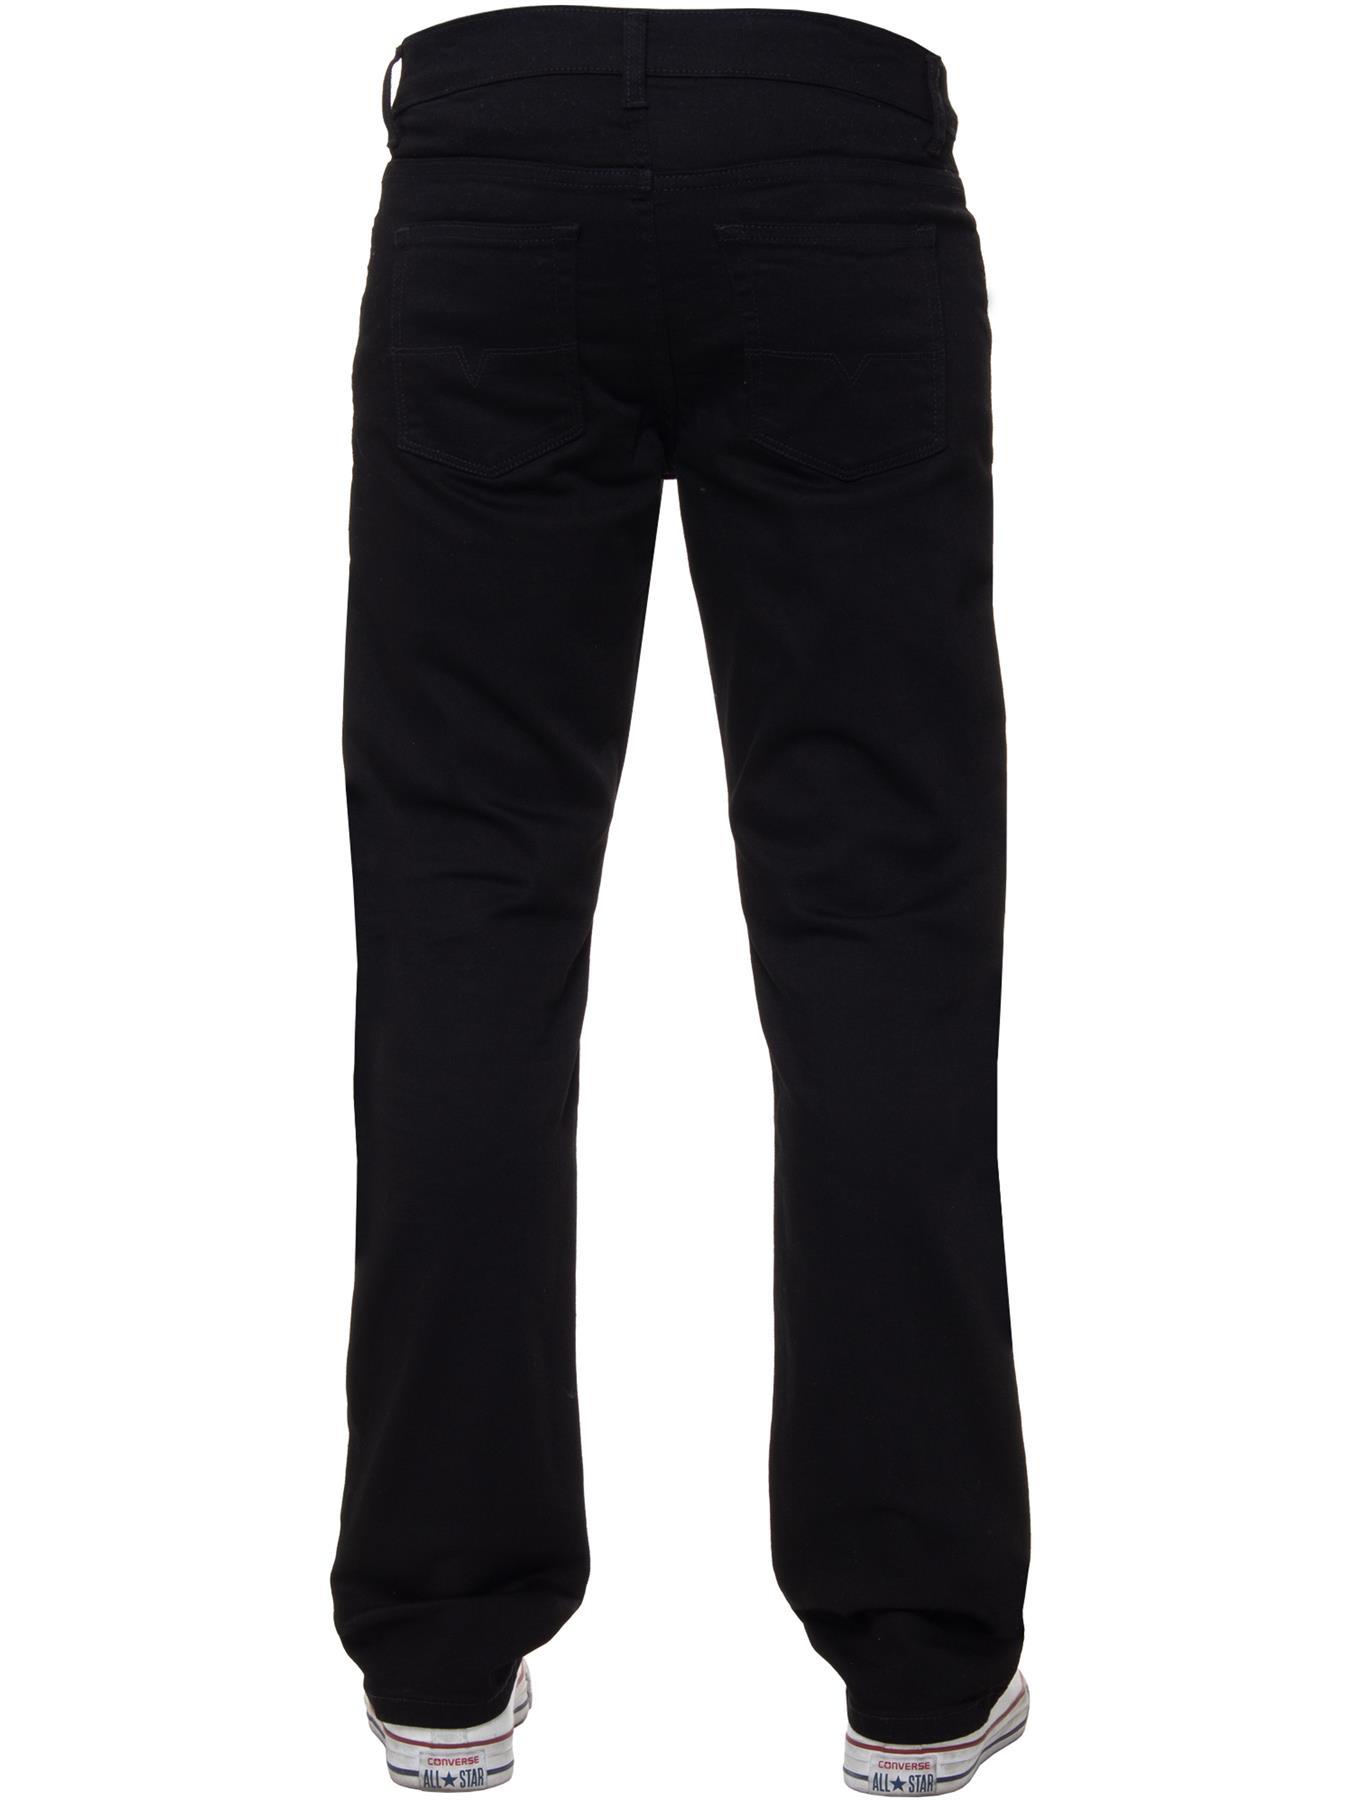 Para-Hombre-Pierna-Recta-Bootcut-Stretch-Denim-Regulares-Pantalon-de-trabajo-Kruze-Todas-Cinturas miniatura 25